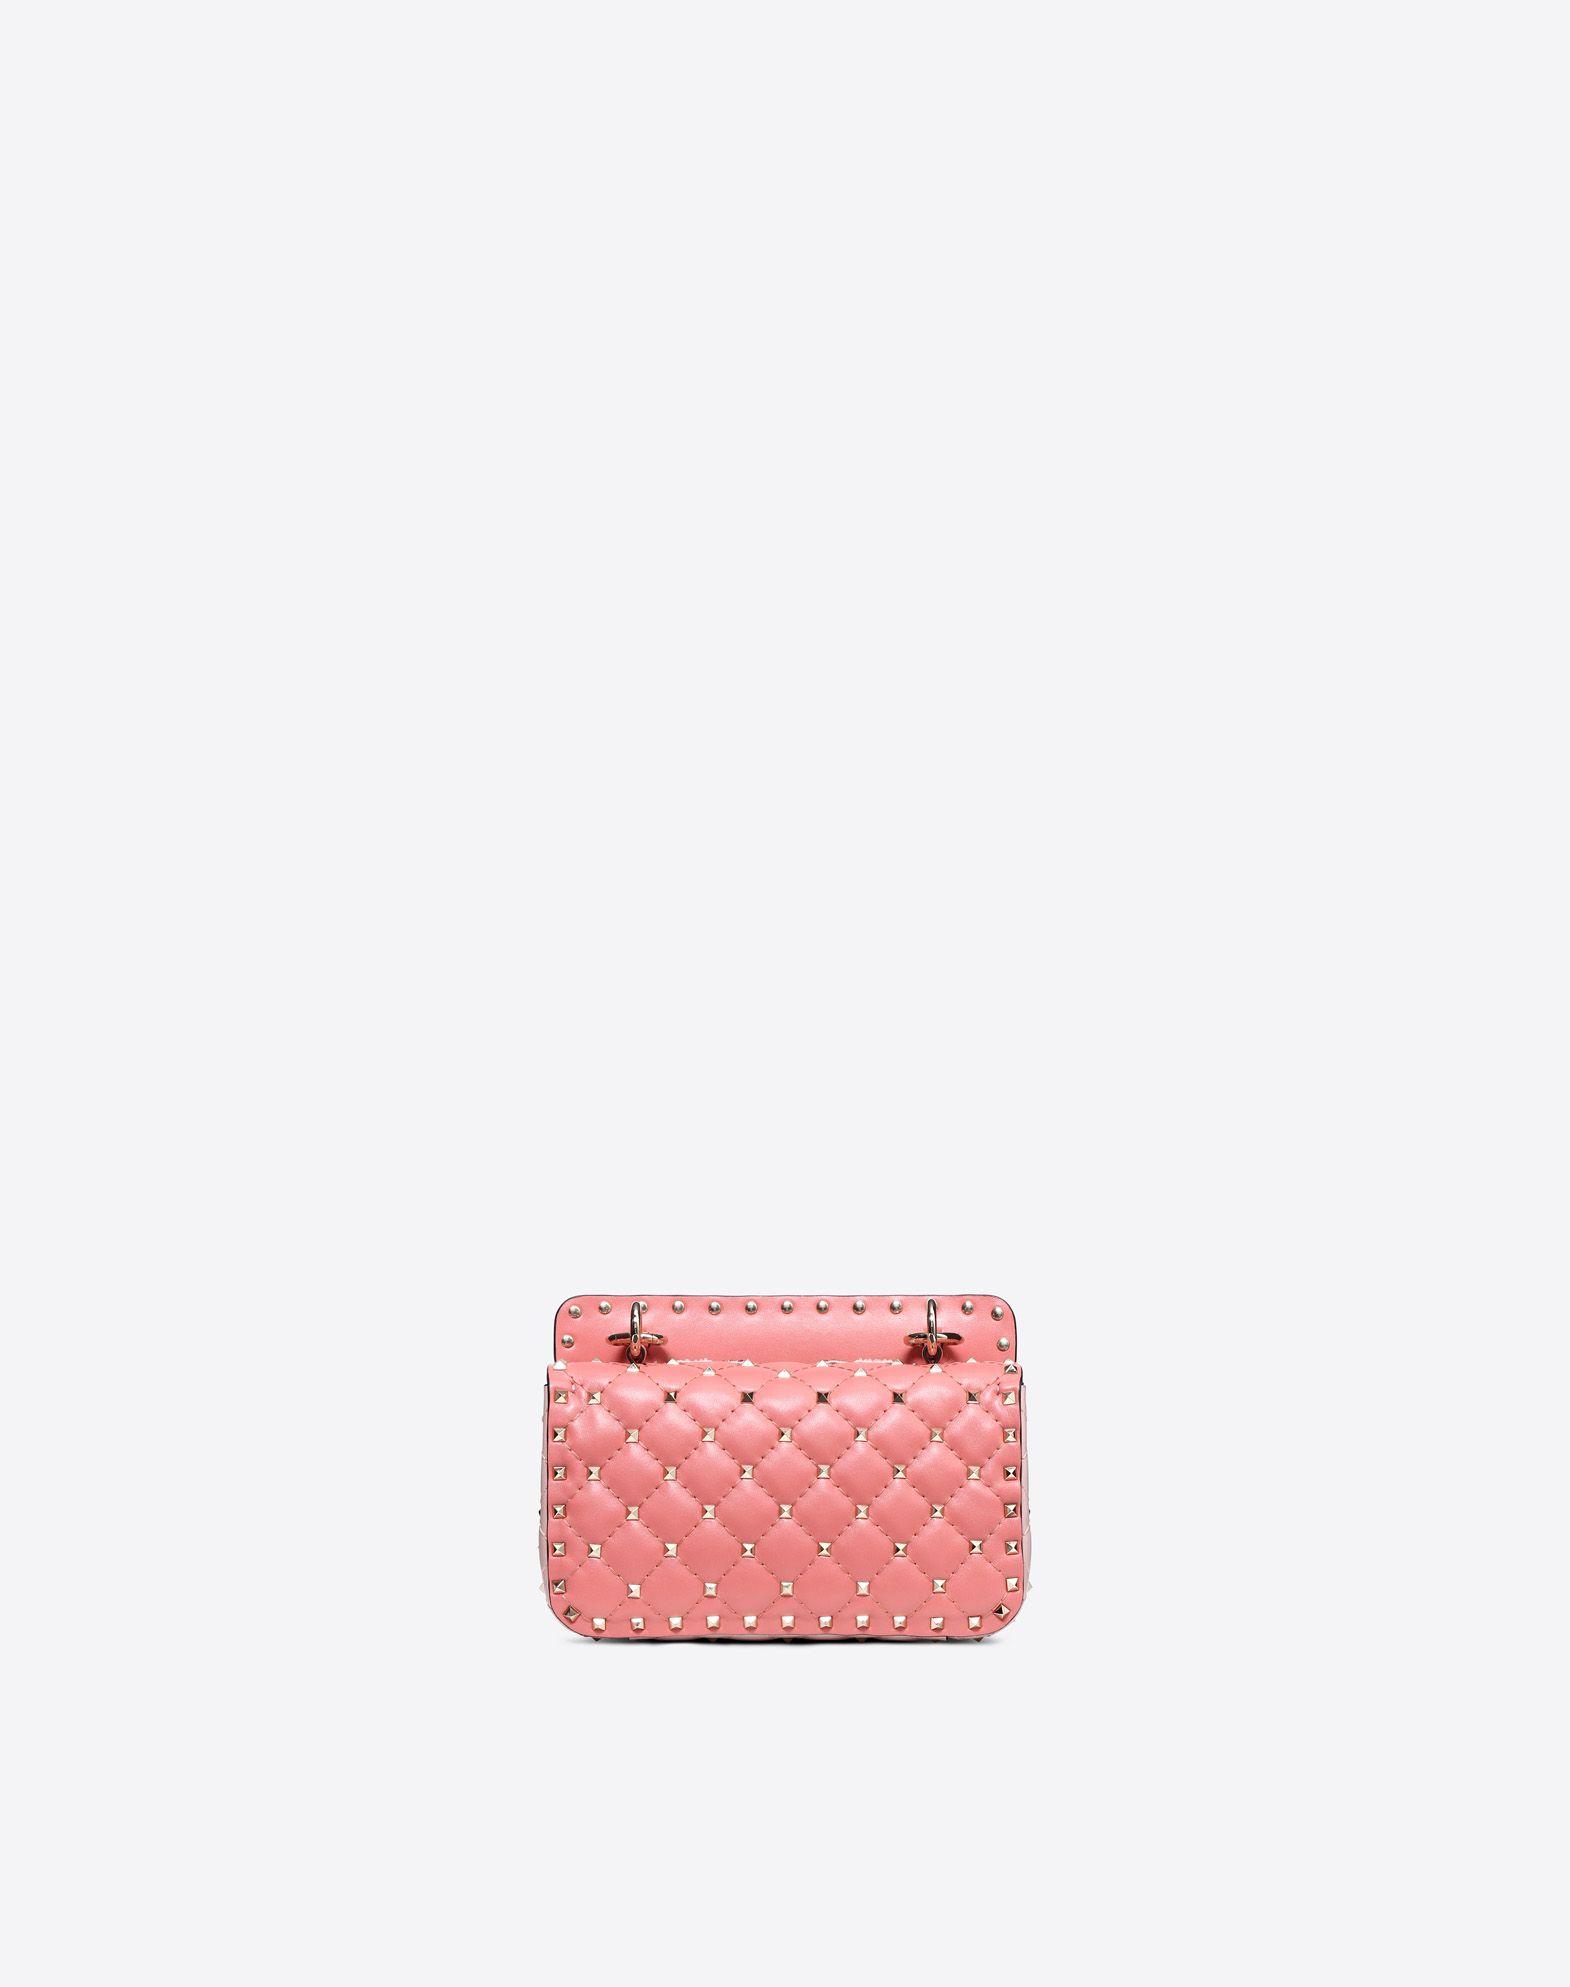 VALENTINO GARAVANI Rockstud Spike.It Small Chain Bag Shoulder bag D d